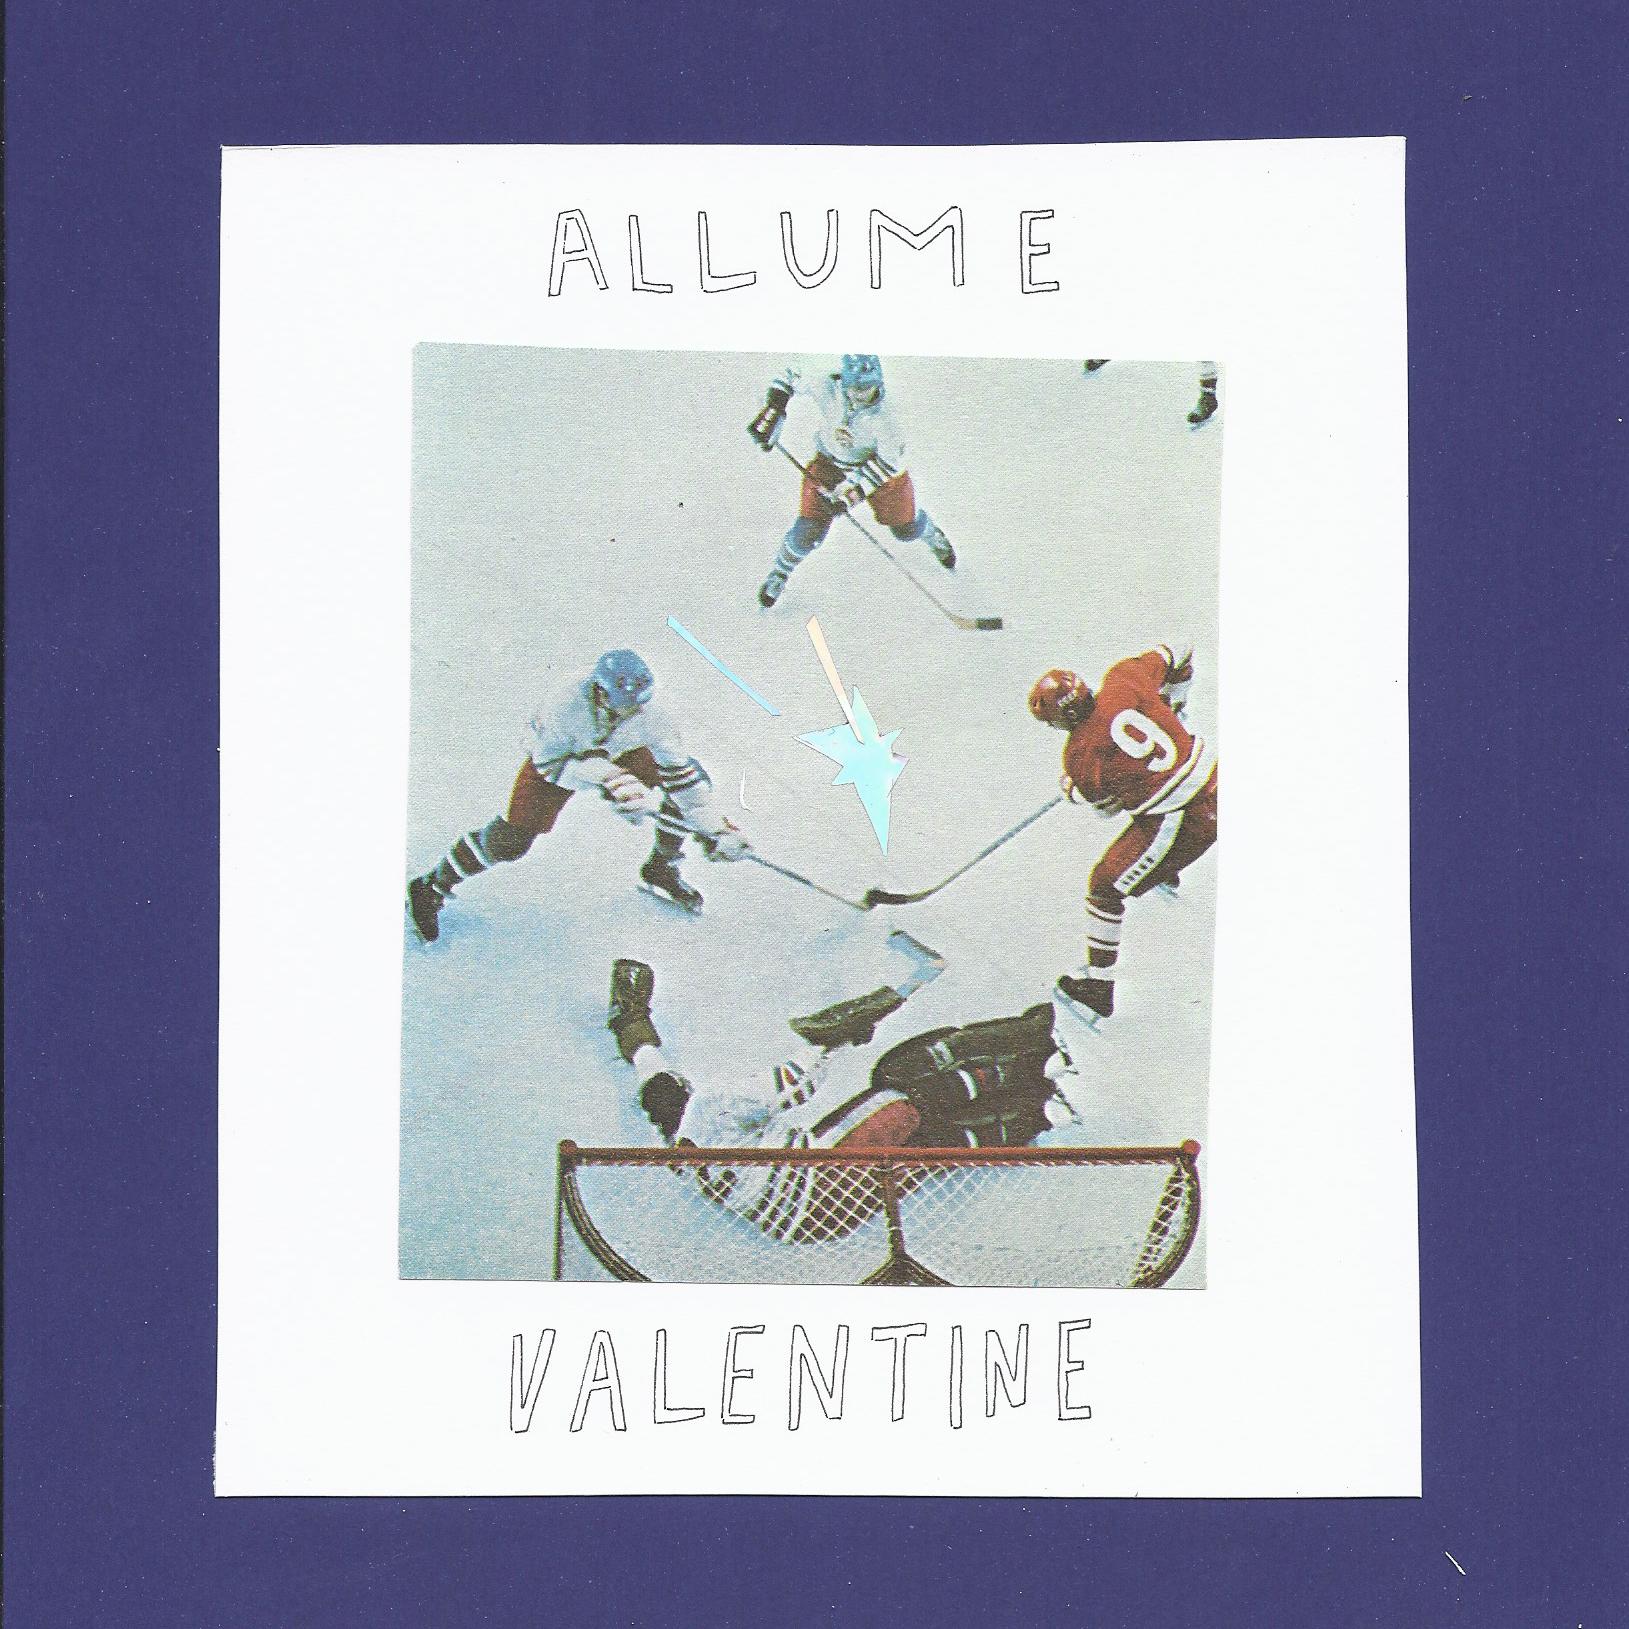 Allume - Valentine